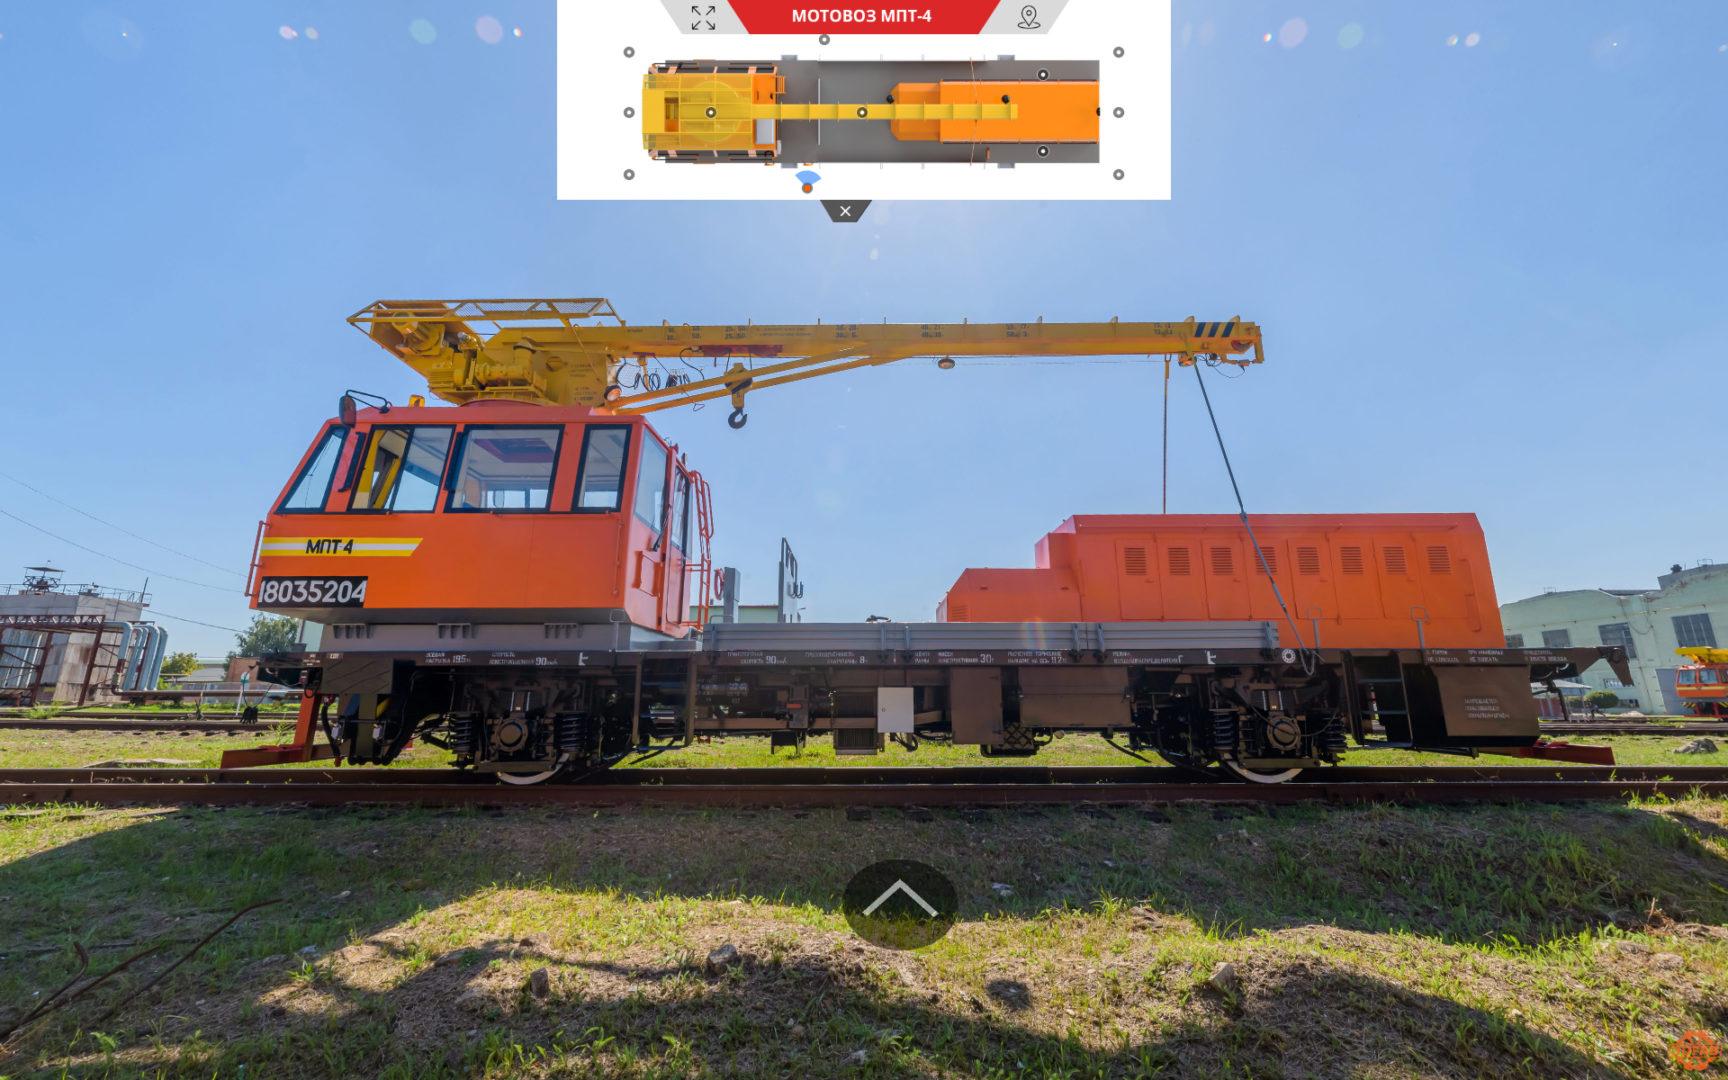 mpt4 title 02a 1728x1080 Виртуальная экскурсия по мотовозу МПТ 4